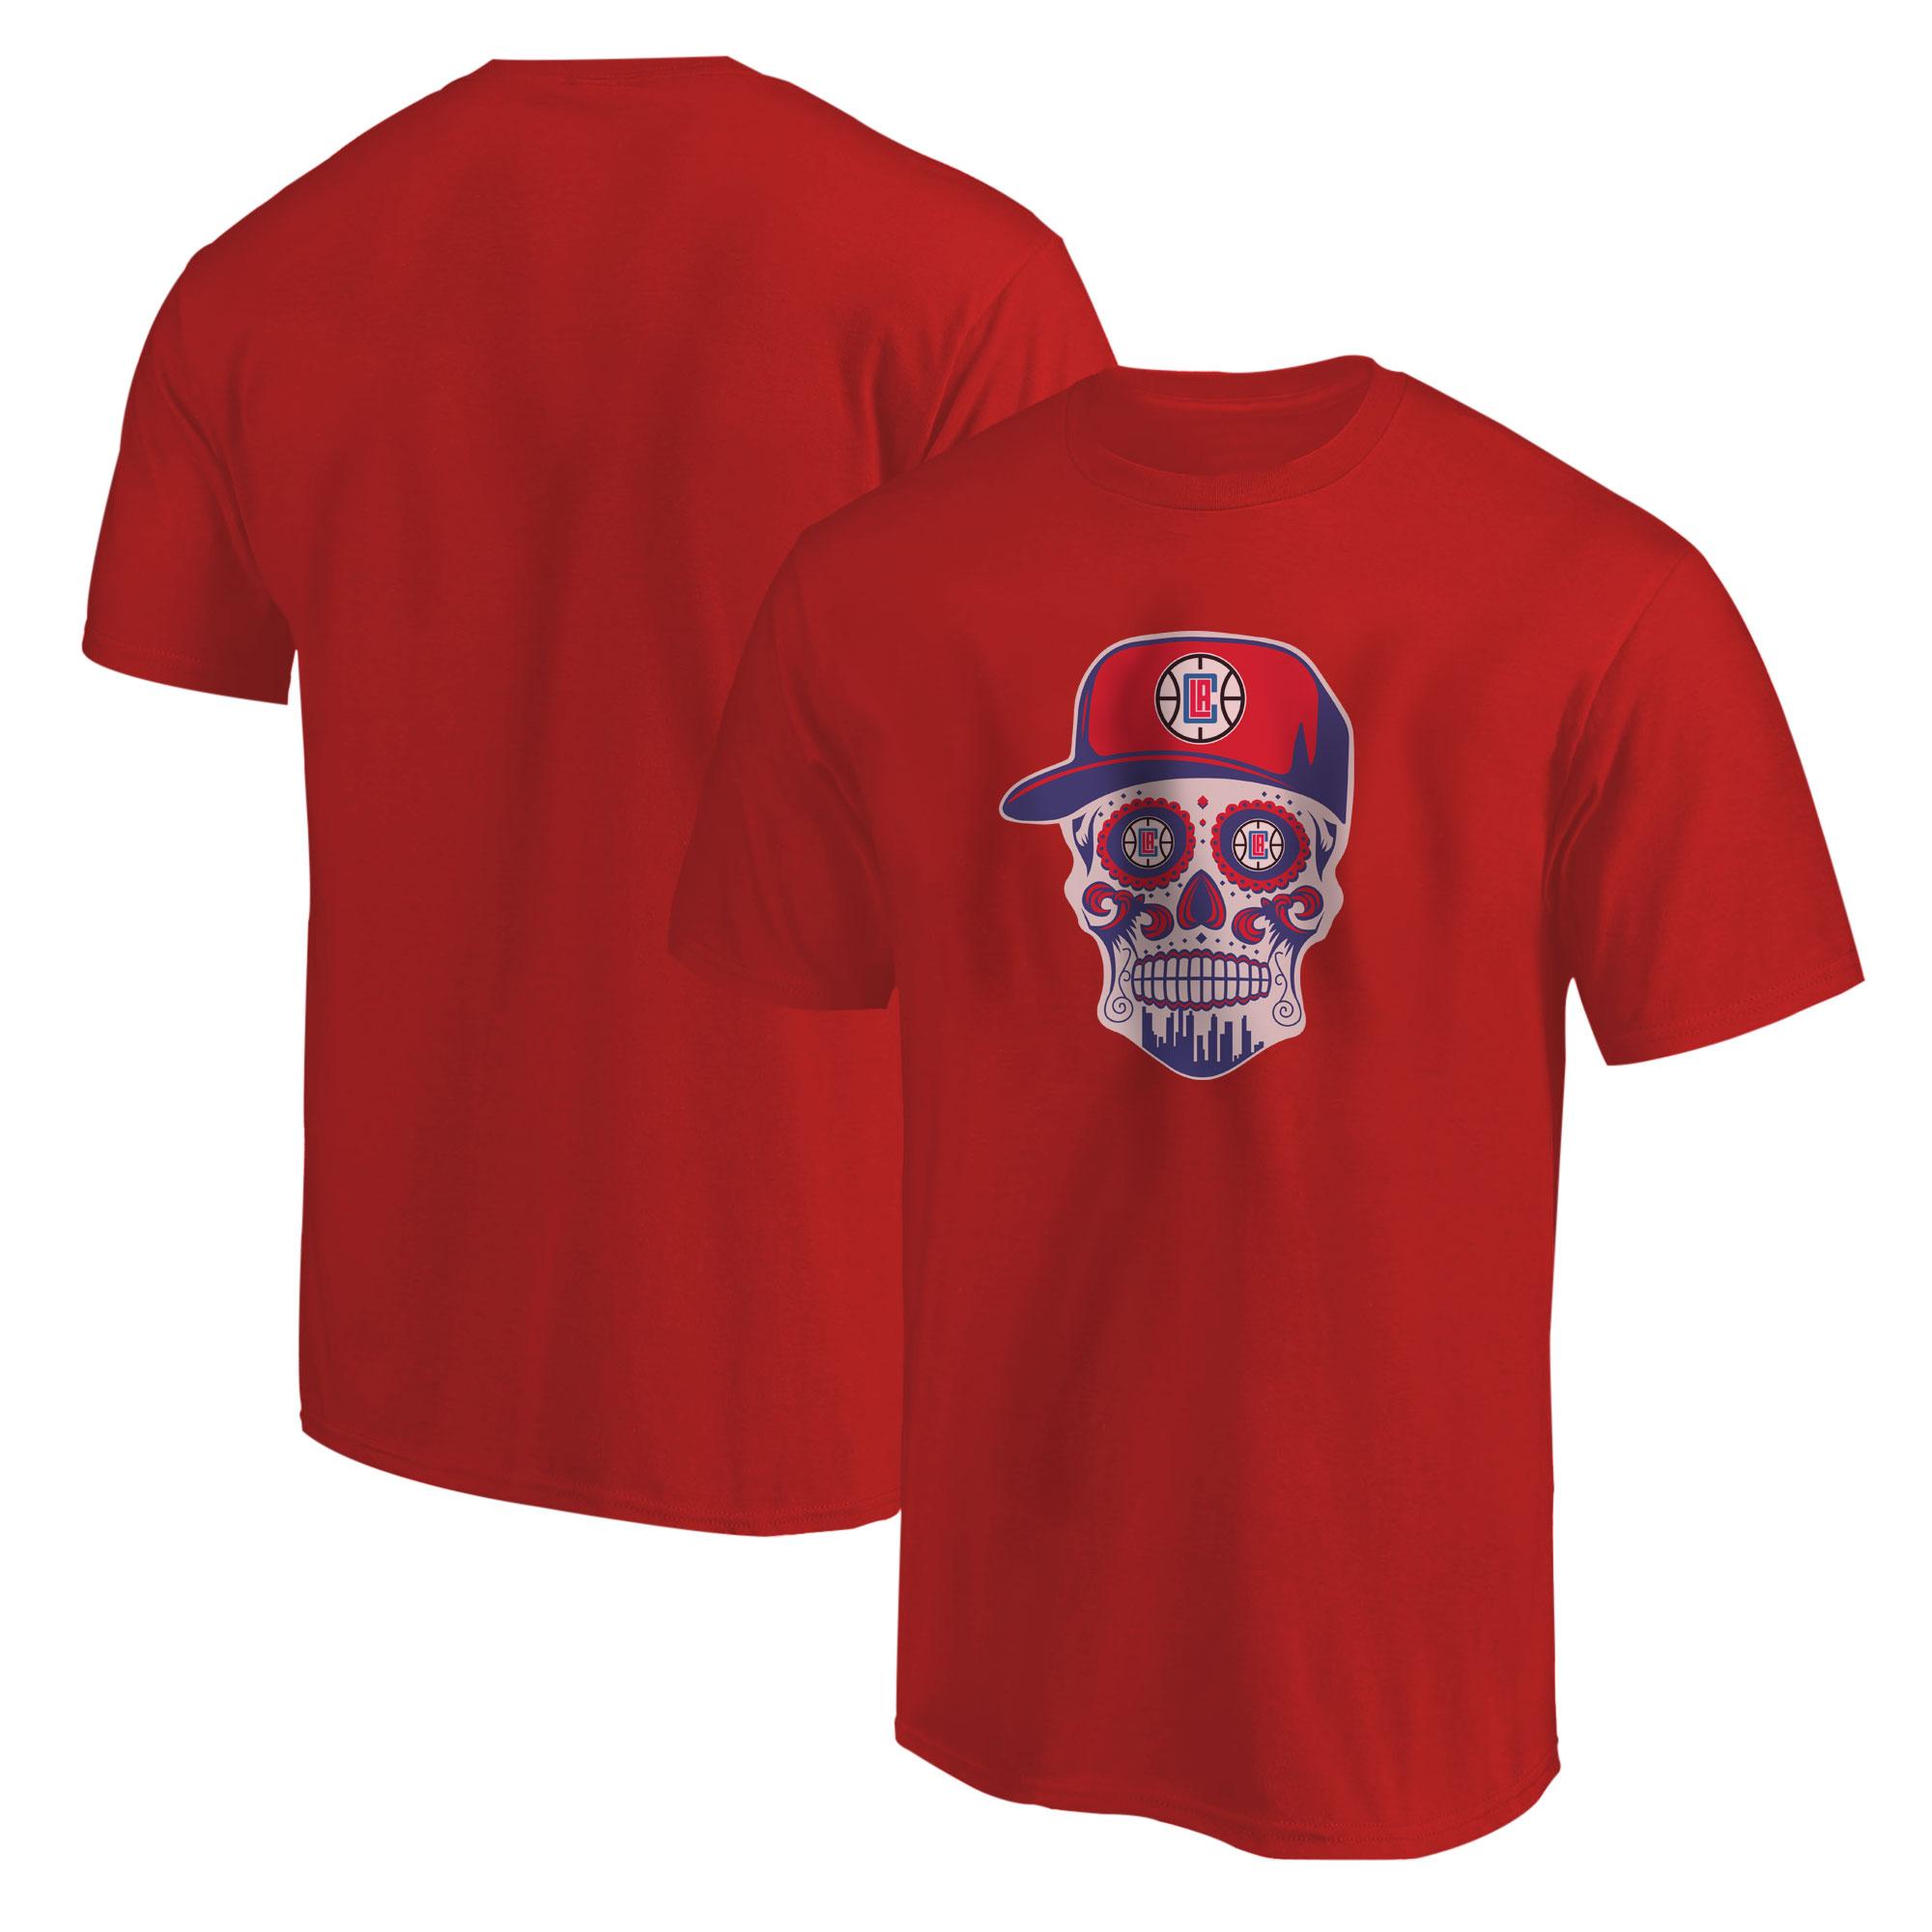 Clippers Skull Tshirt (TSH-RED-NP-450-CLIPPERS-Skull)